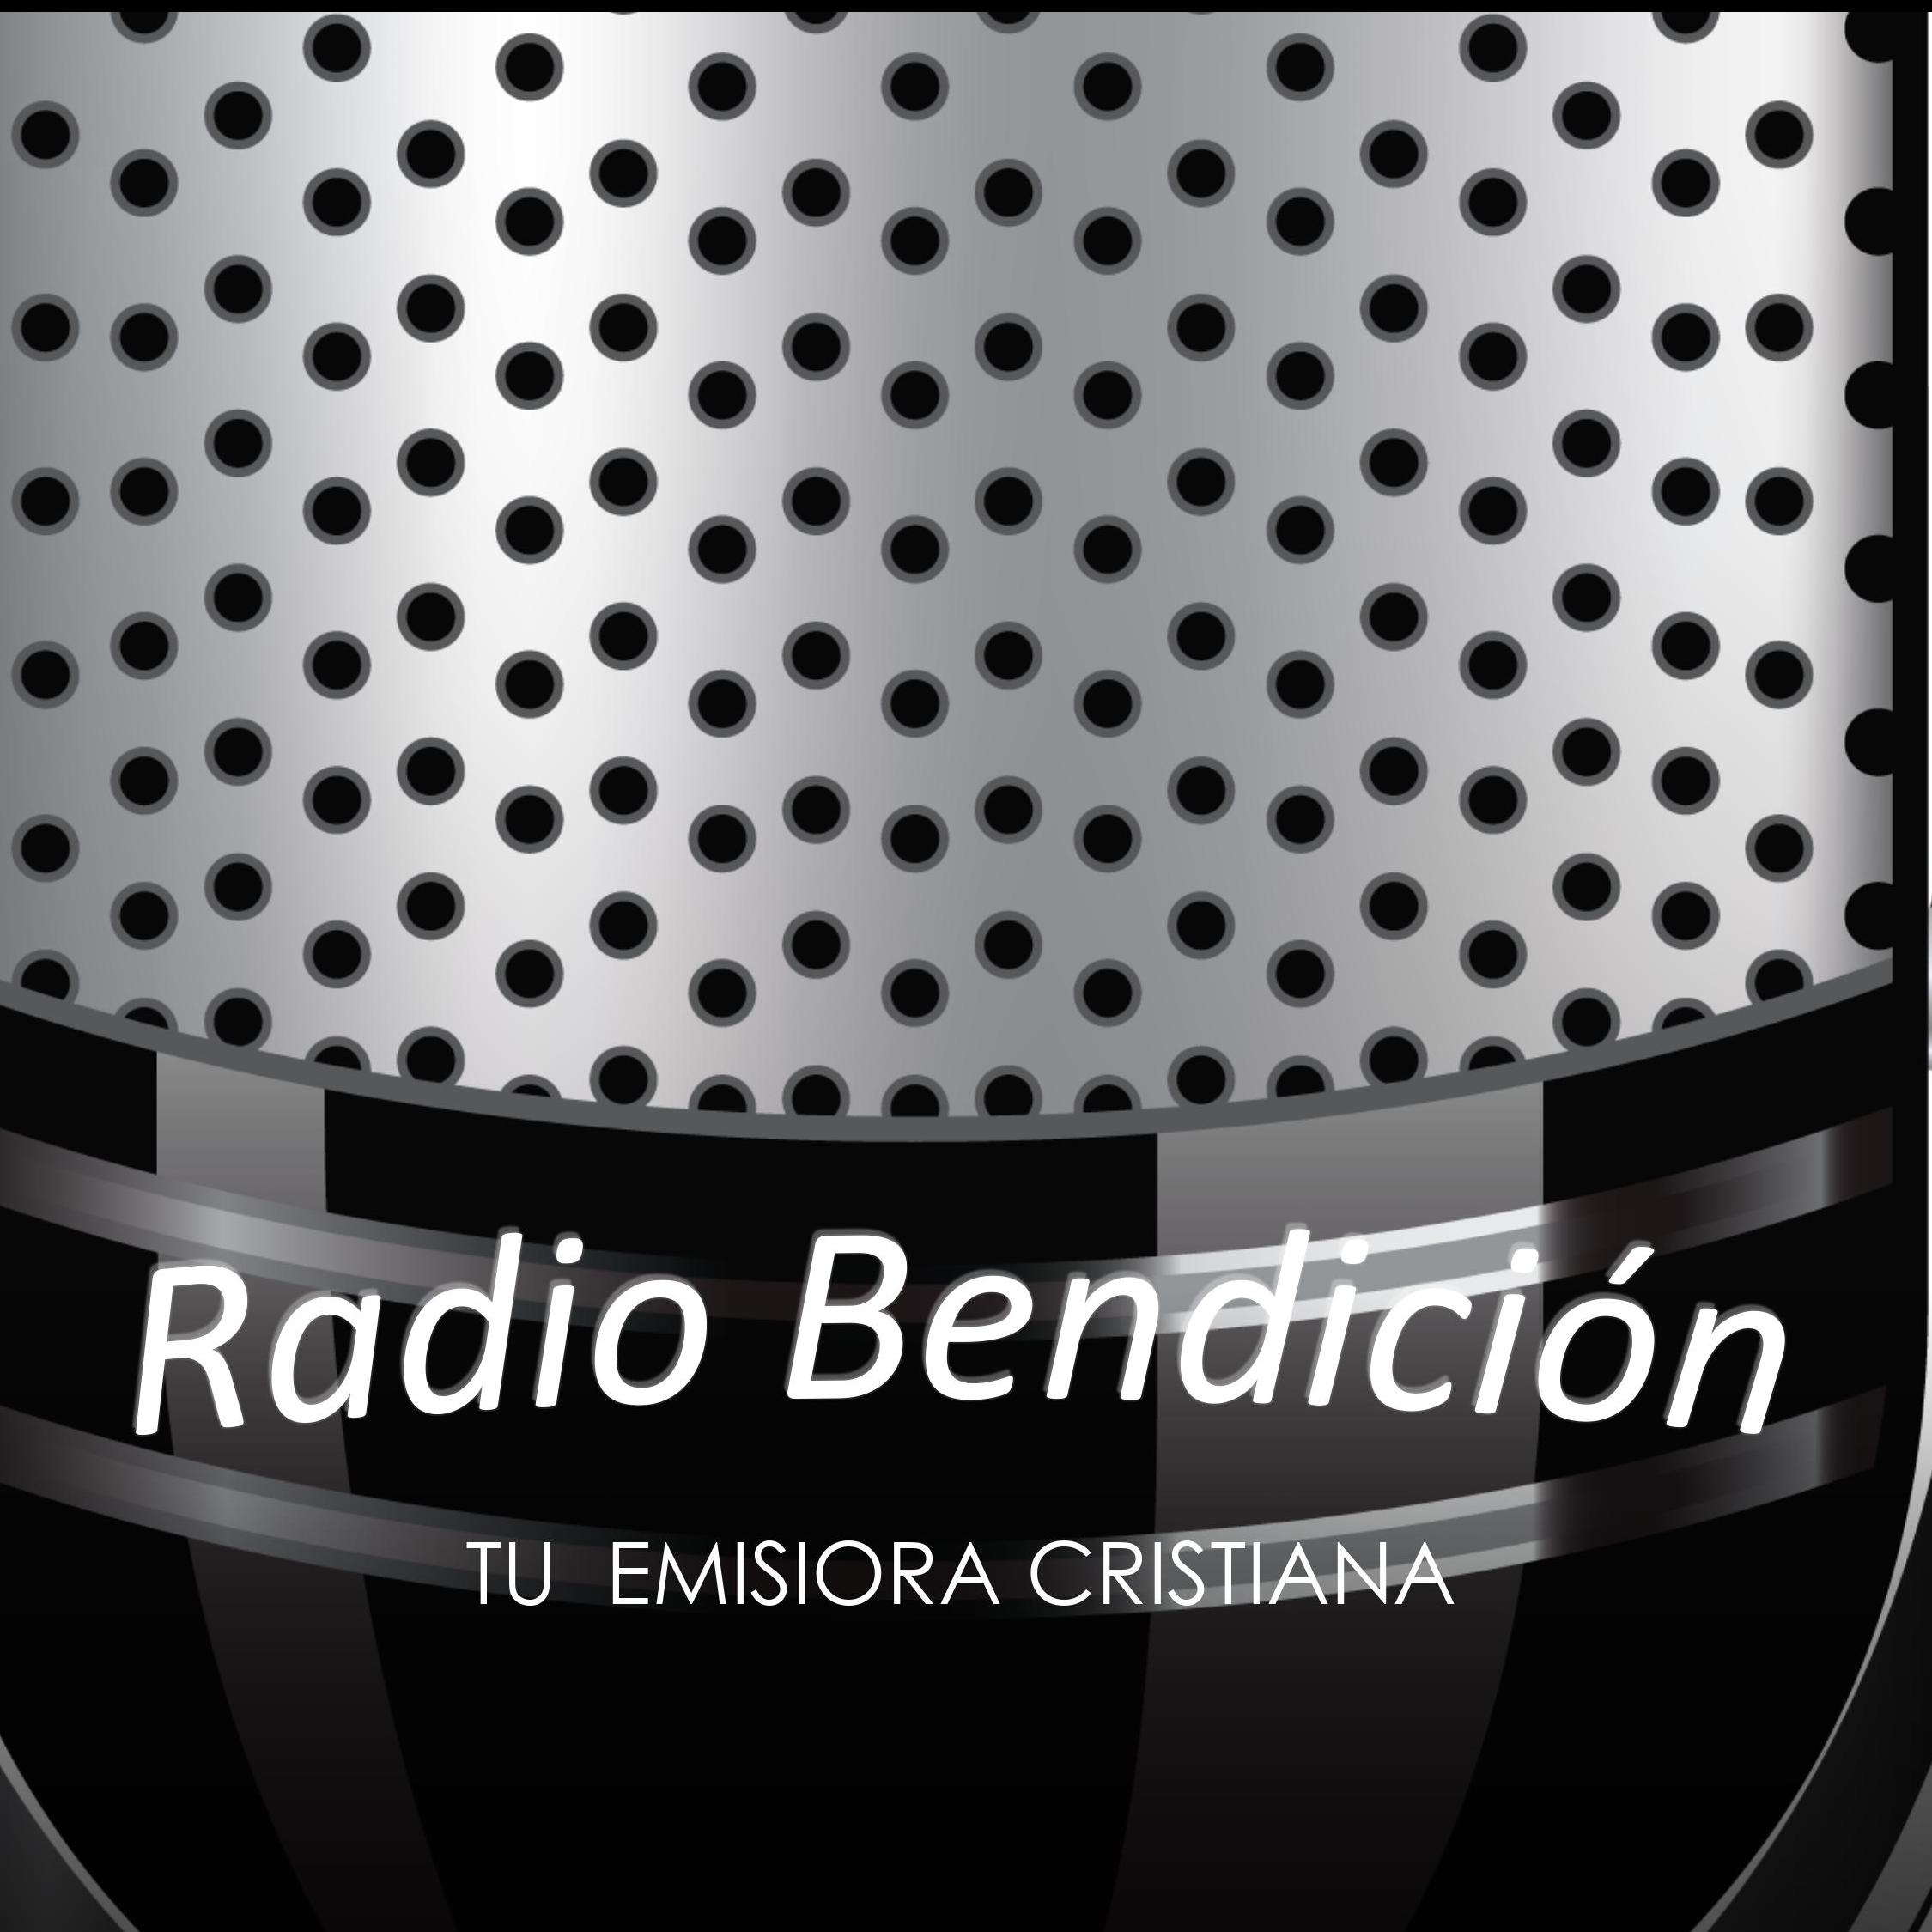 radiobendicionfr